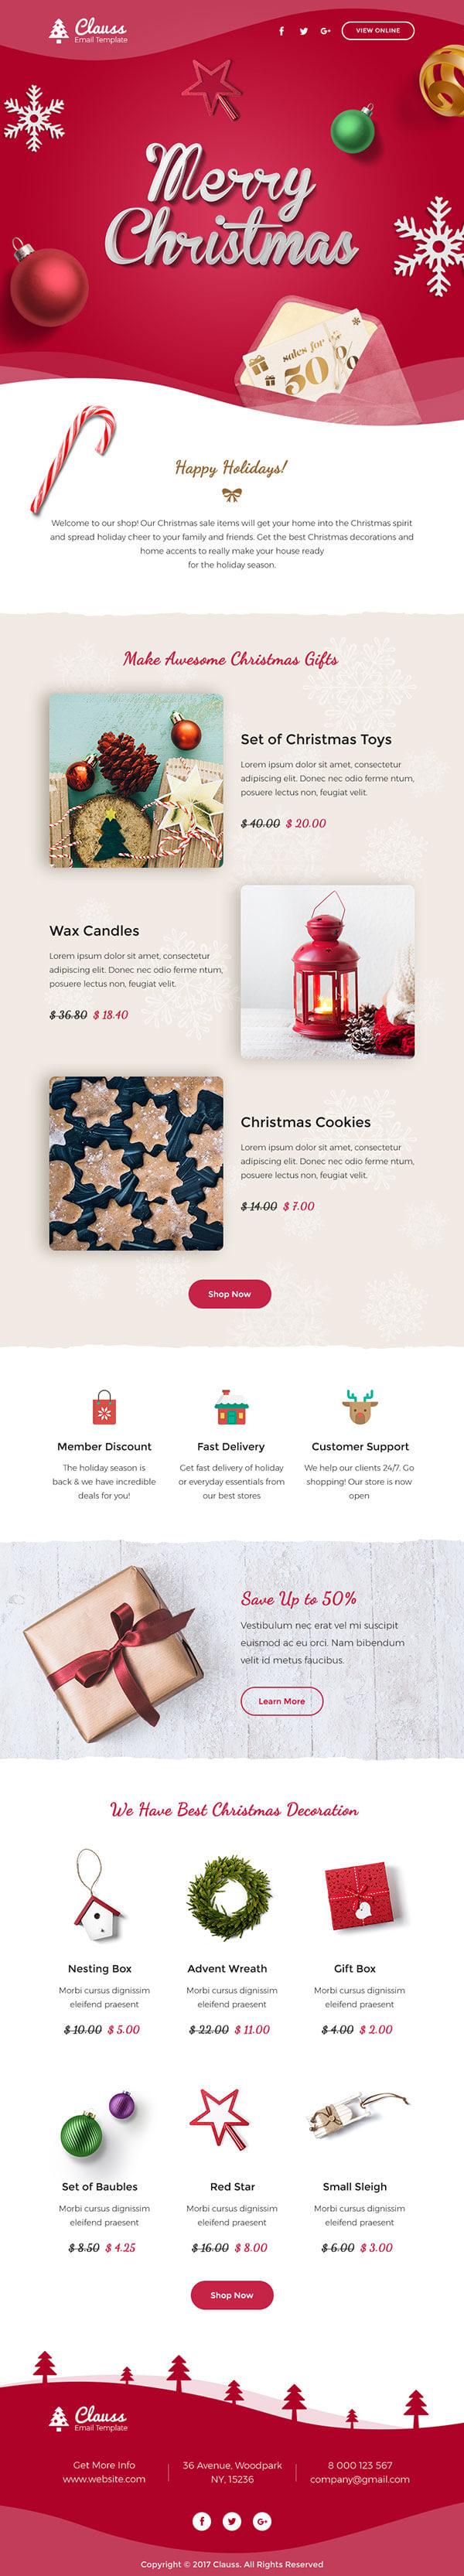 merry christmas email template - Tikir.reitschule-pegasus.co